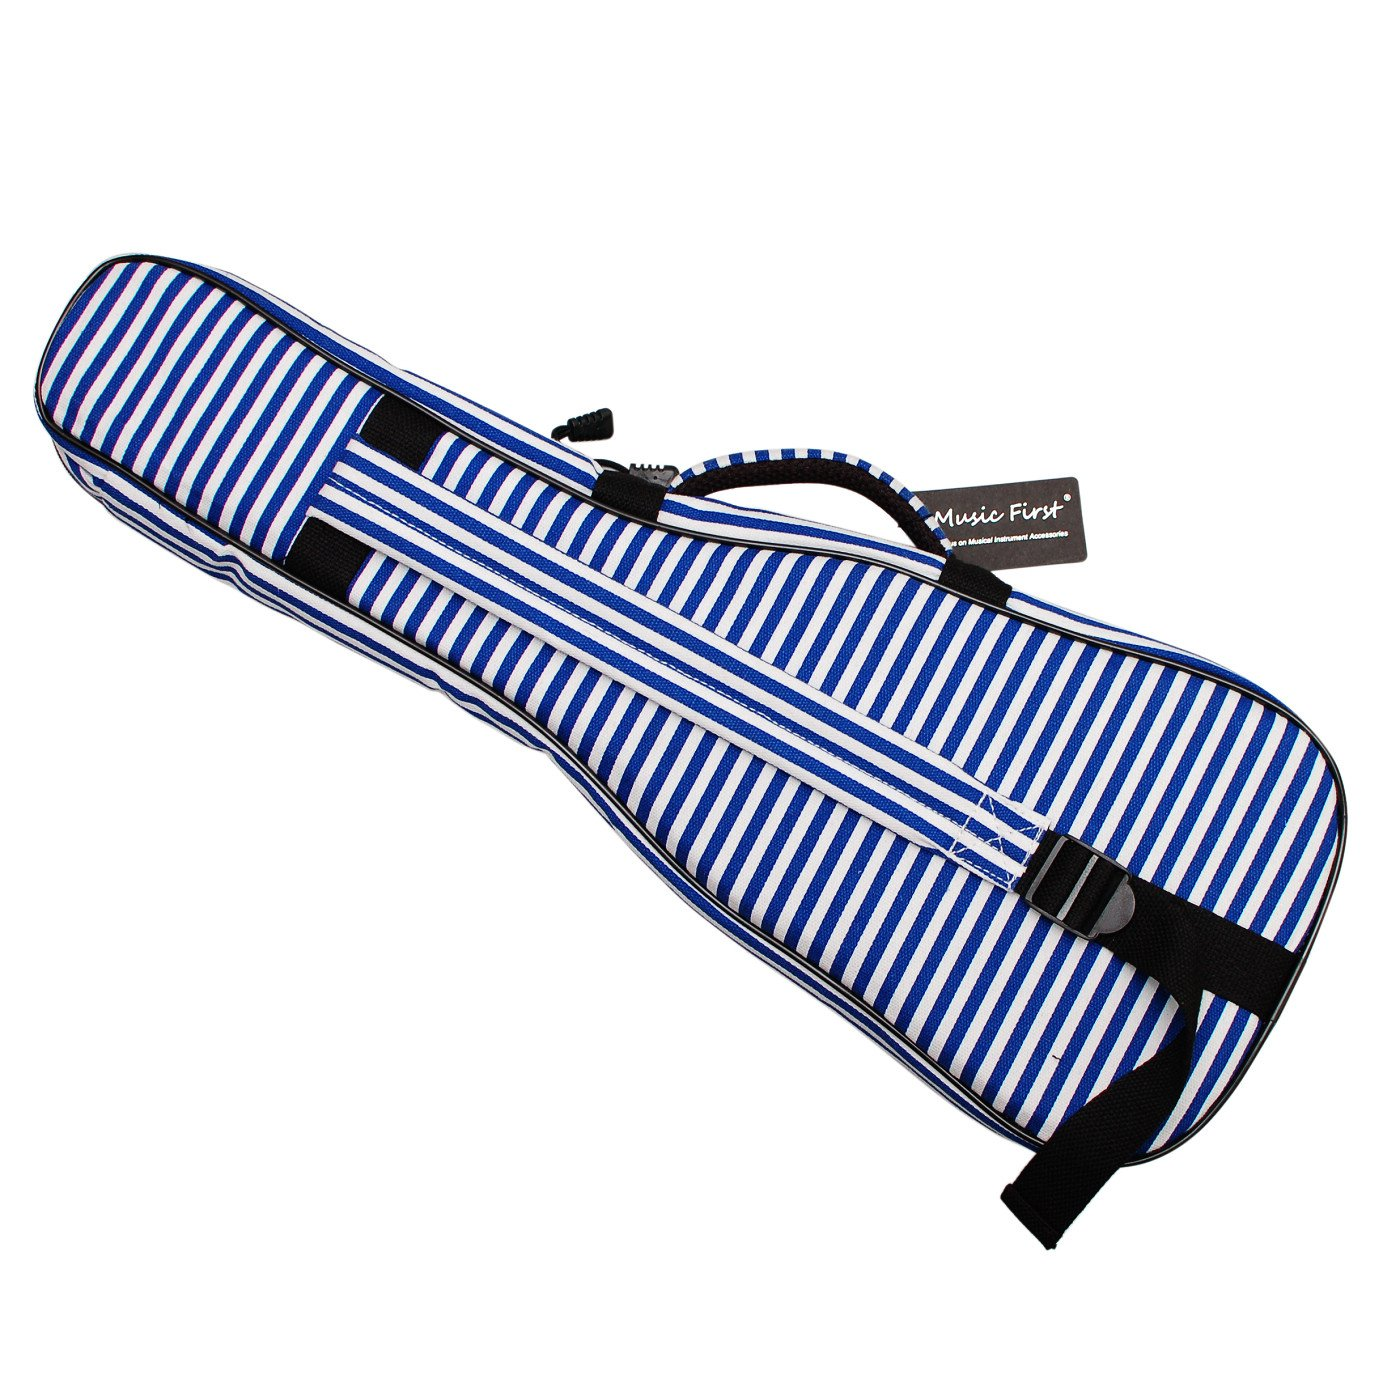 MUSIC FIRST Hand Portable 23'' Concert Cotton Canvas Blue Sailor's Striped Ukulele Bag Ukulele Cover Ukulele Case V2.0 by MUSIC FIRST (Image #3)